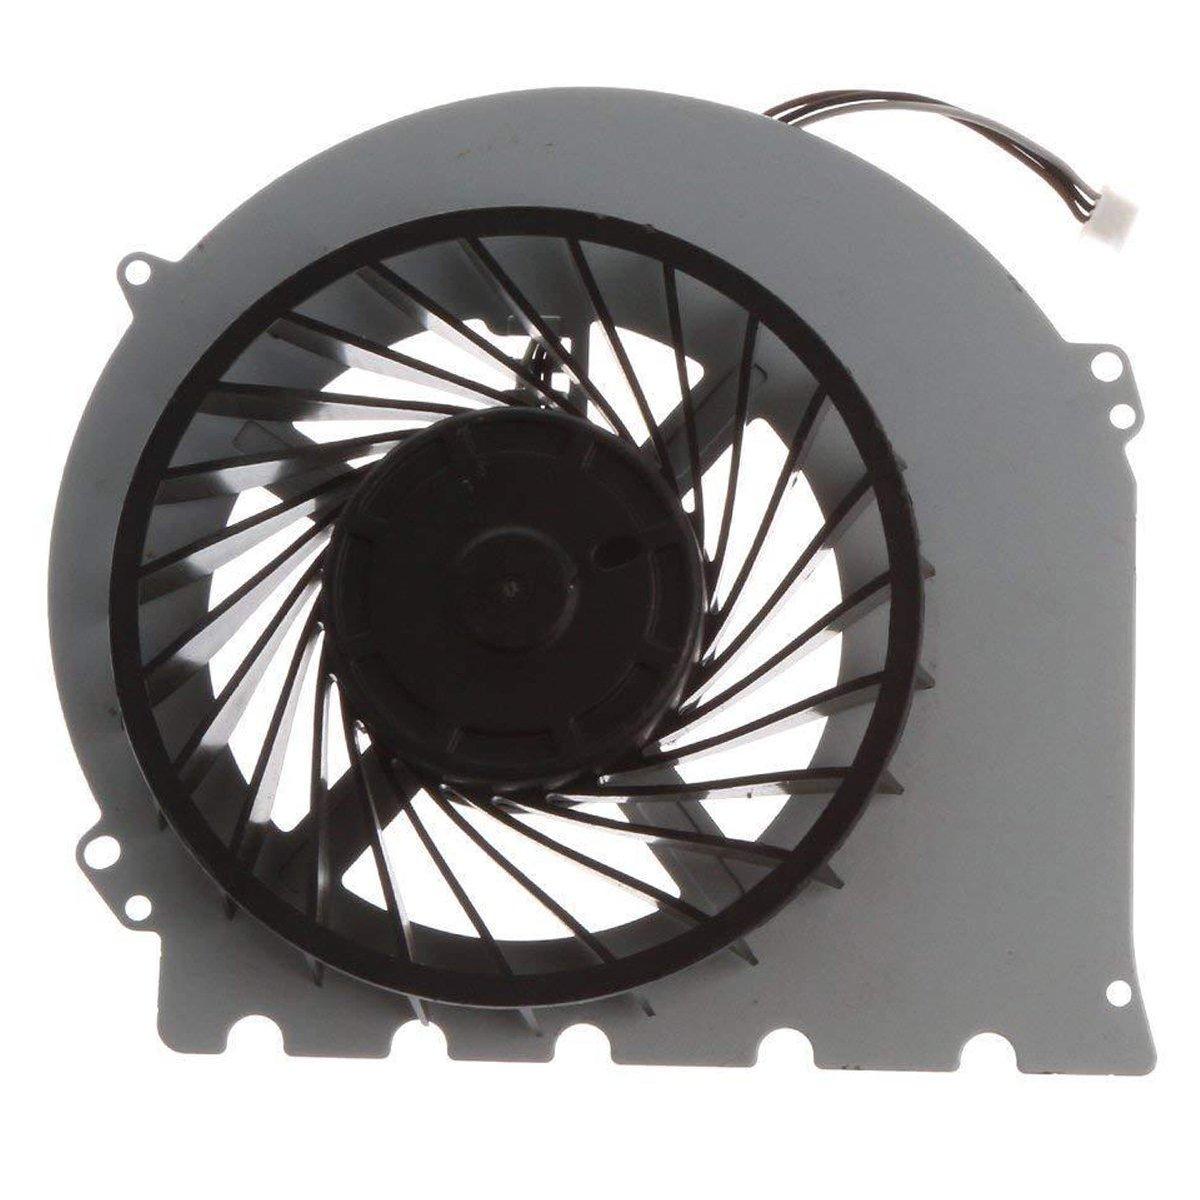 J&L Electronics Internal 3 Pin CPU Cooling Fan for PS4 Slim CUH-2015A CUH-2115B OEM